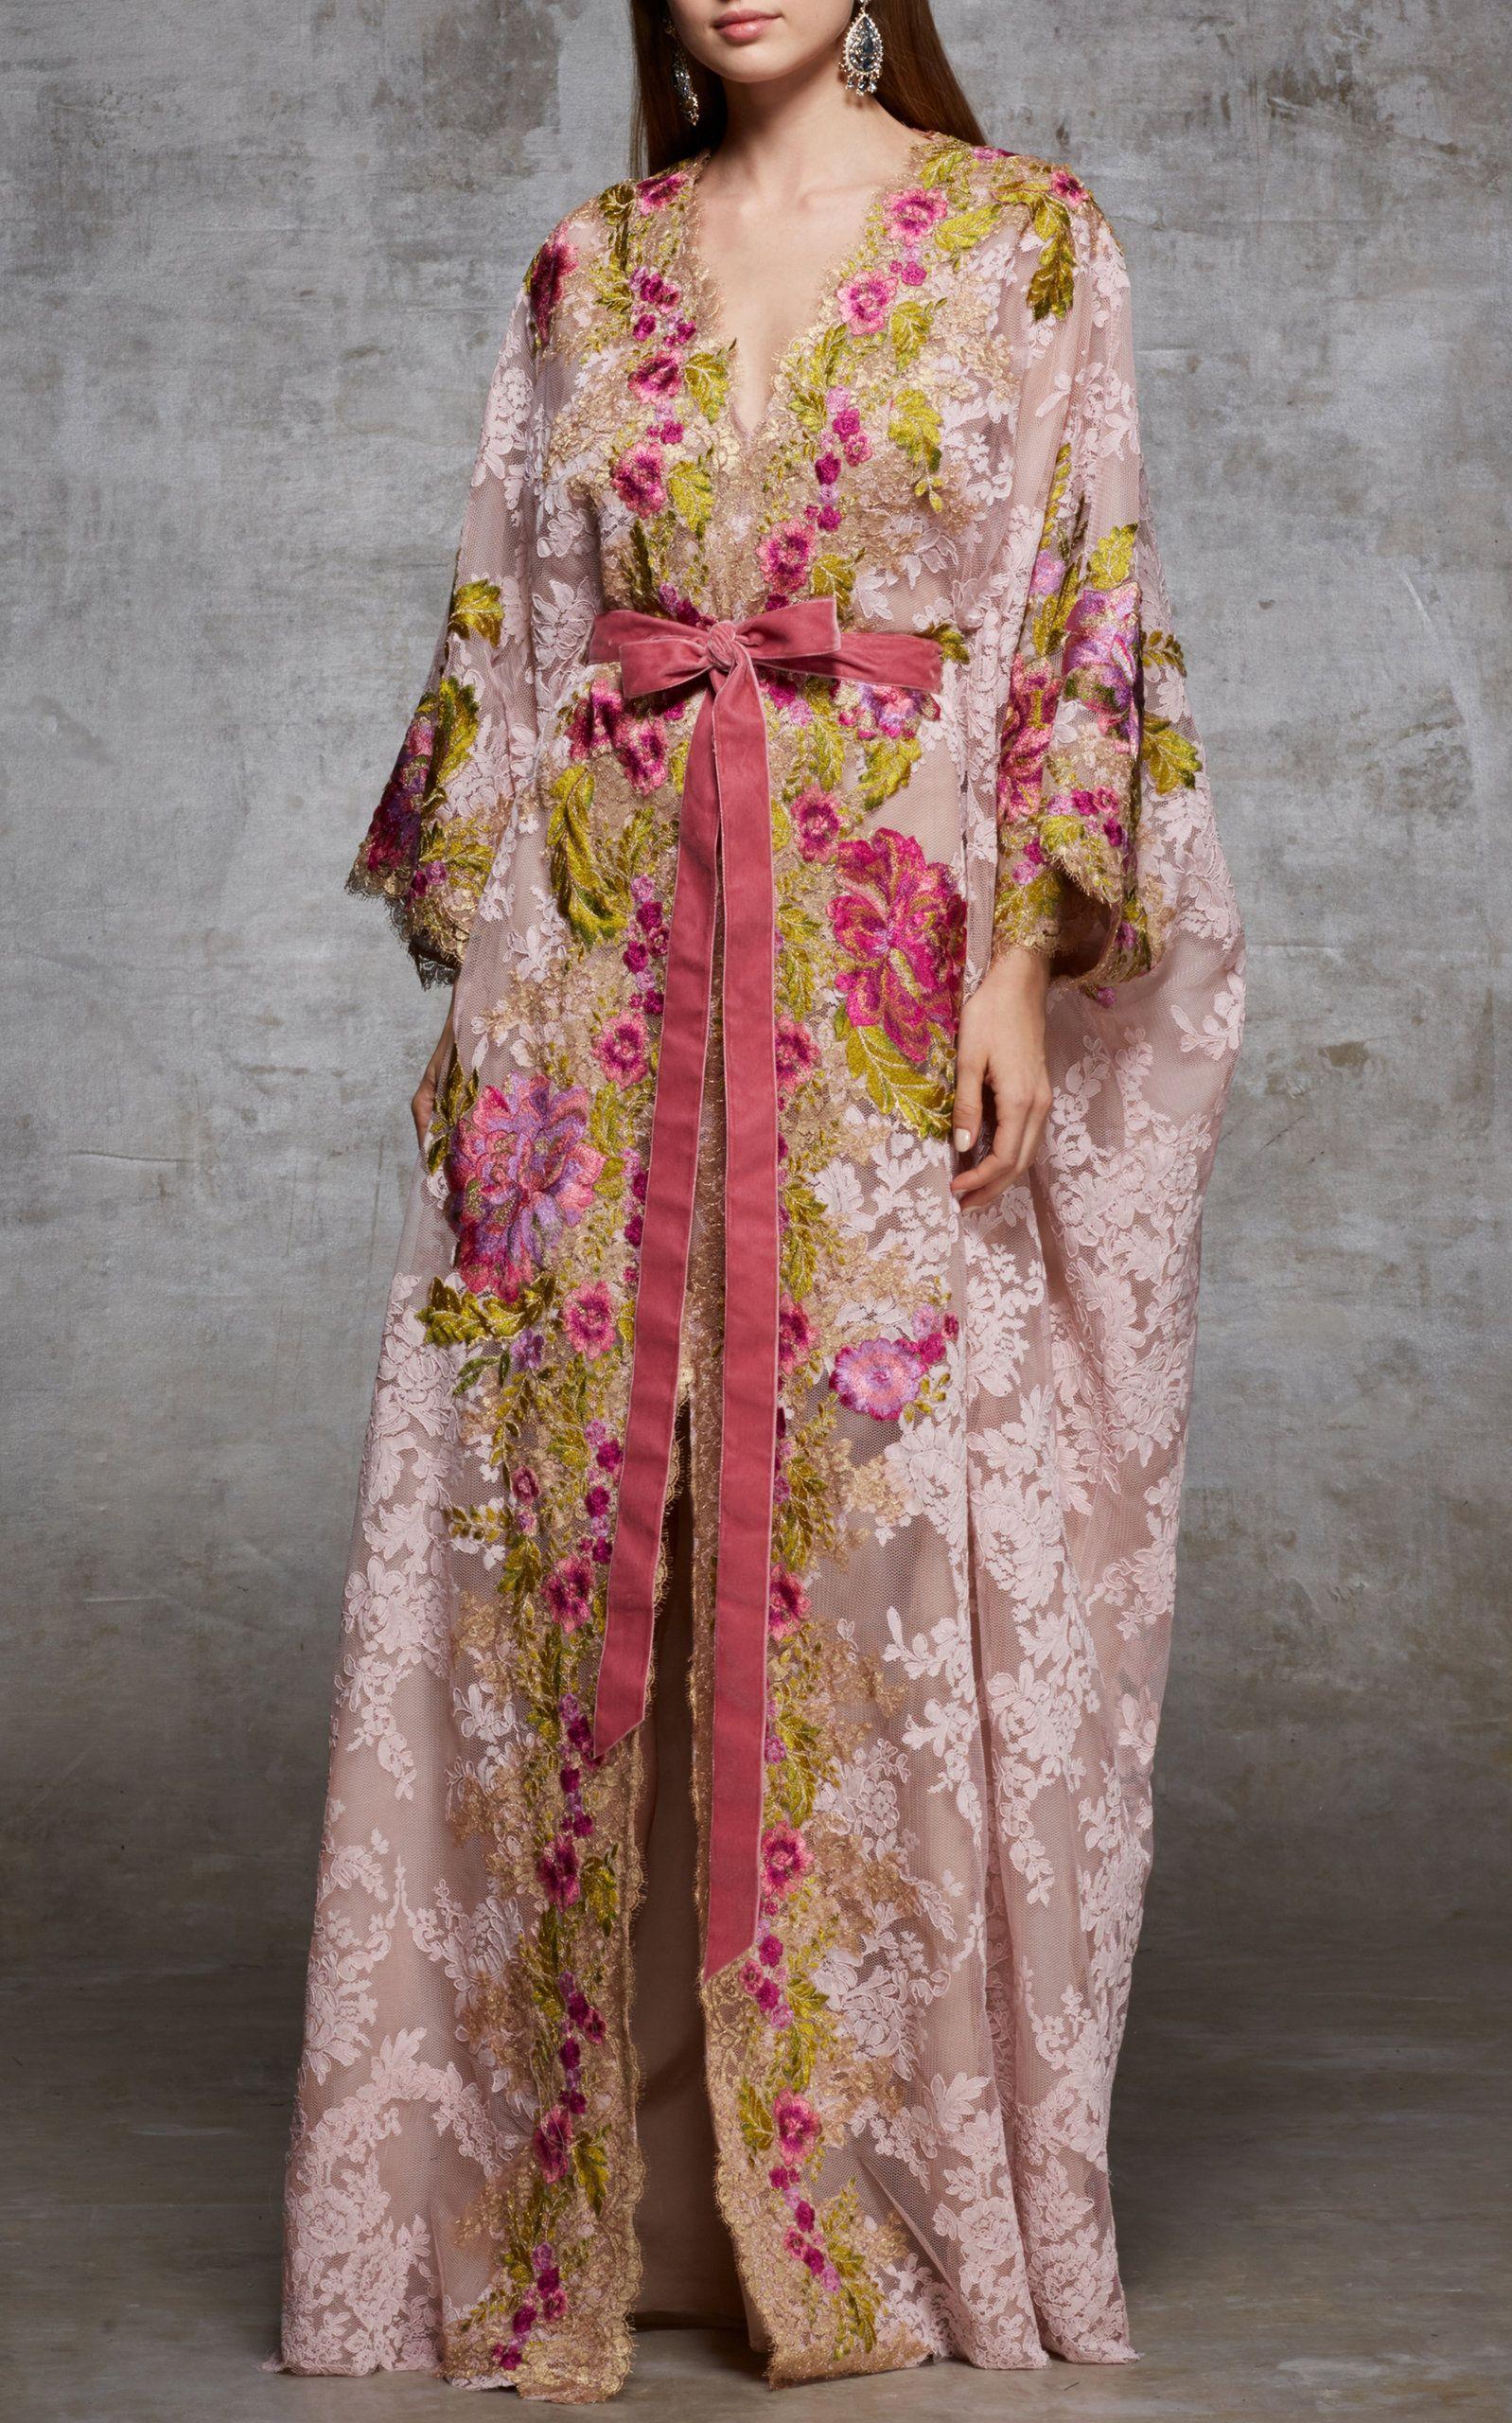 Lace Beaded Caftan Marchesa 100% Original Exclusive For Sale Sale Outlet Store YkLQT